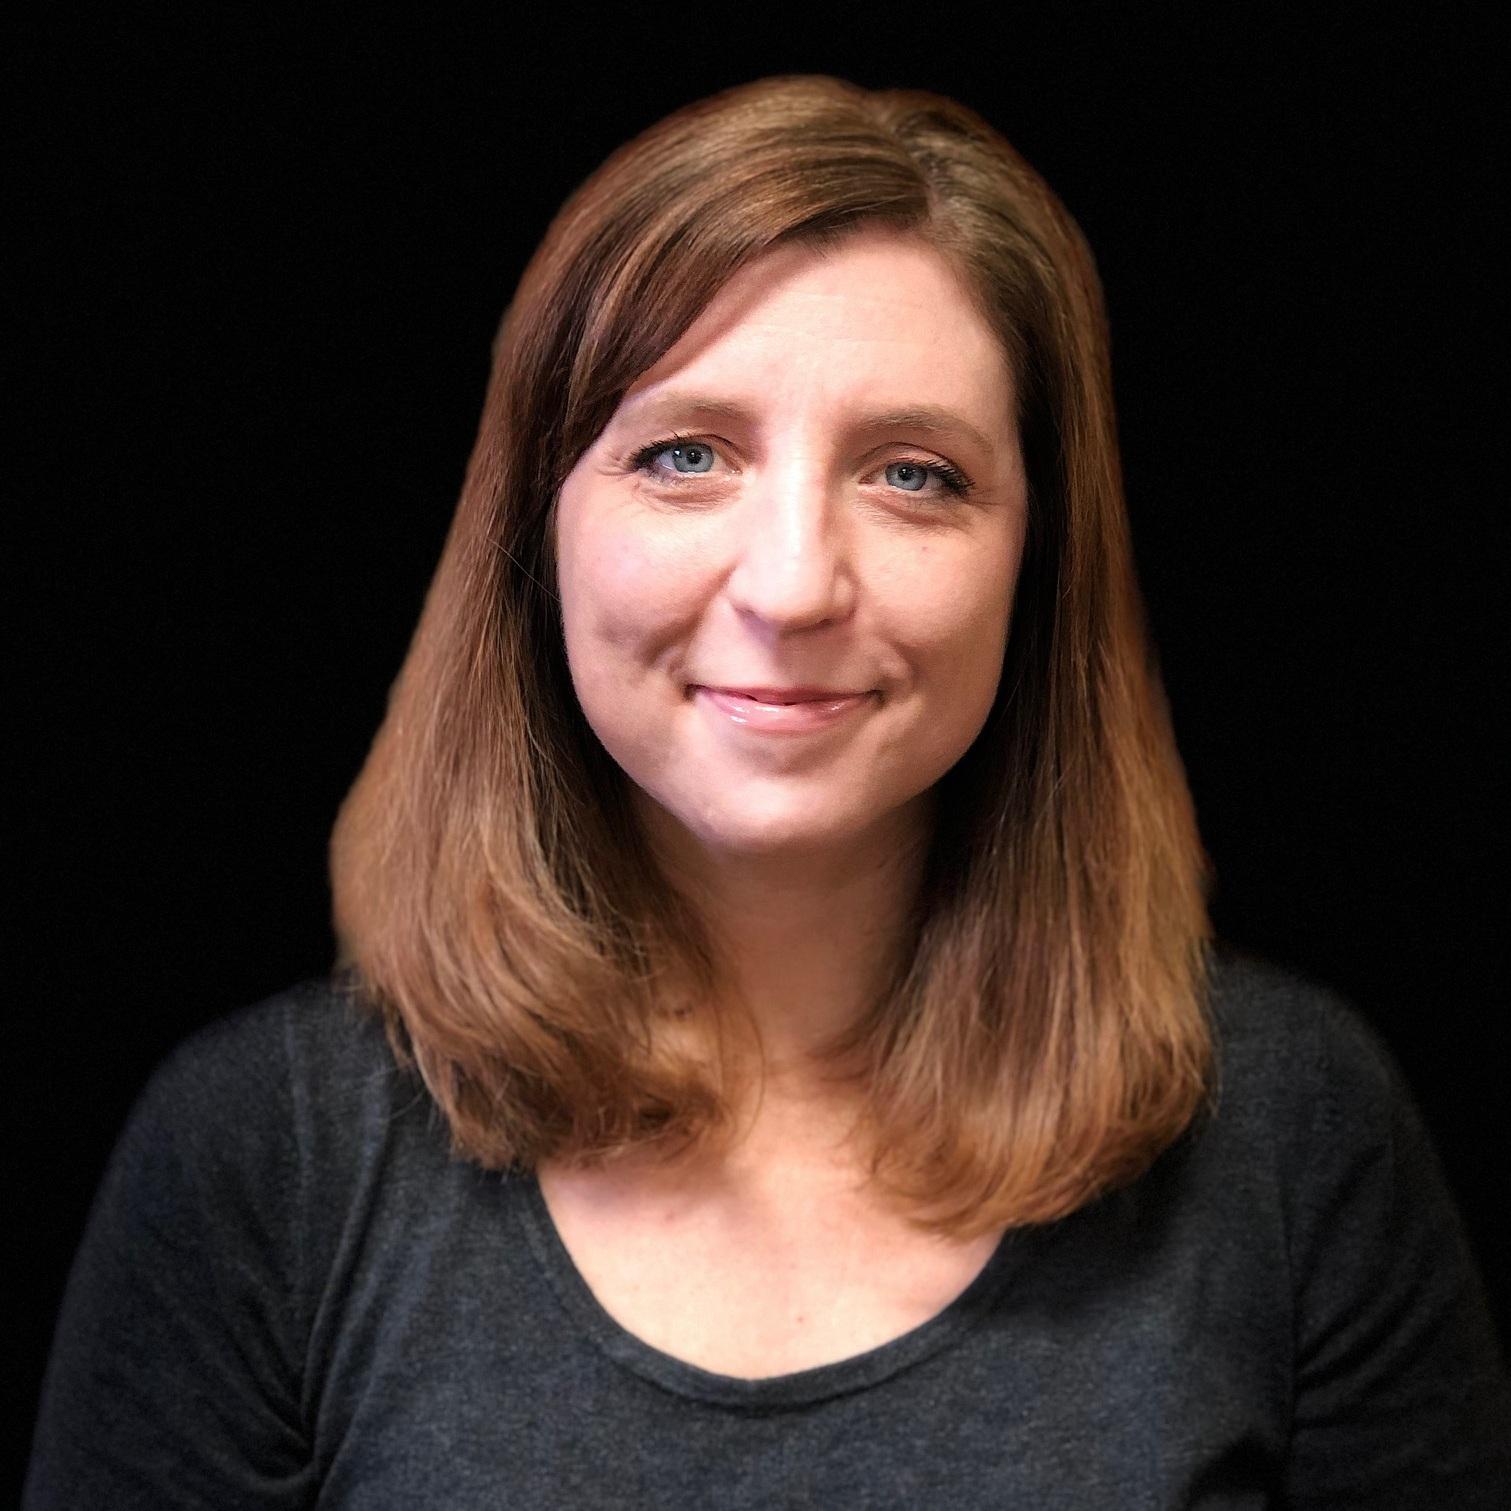 Sarah Paradoski - Development DirectorEmail: sarah@irwpSTL.orgExtension: 102